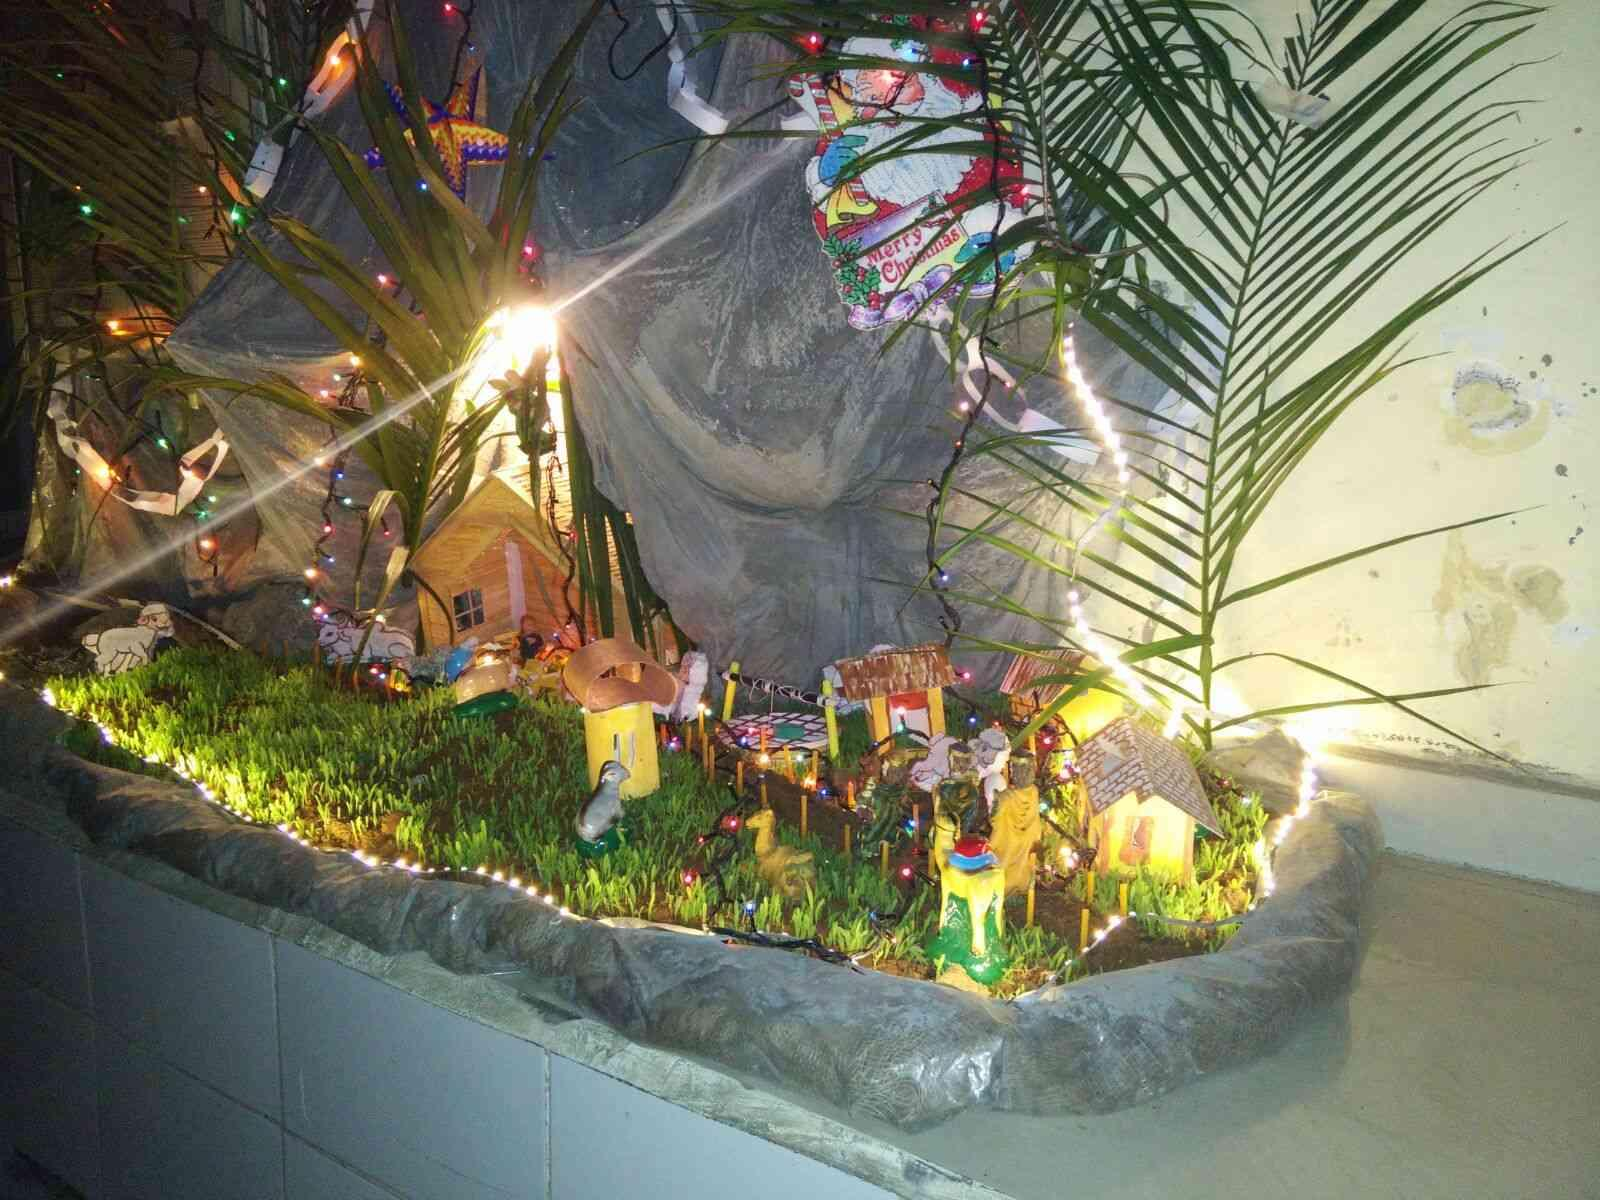 Christmas Decoration Ideas for Indian Homes, Christmas Tree Decor Ideas, Tips